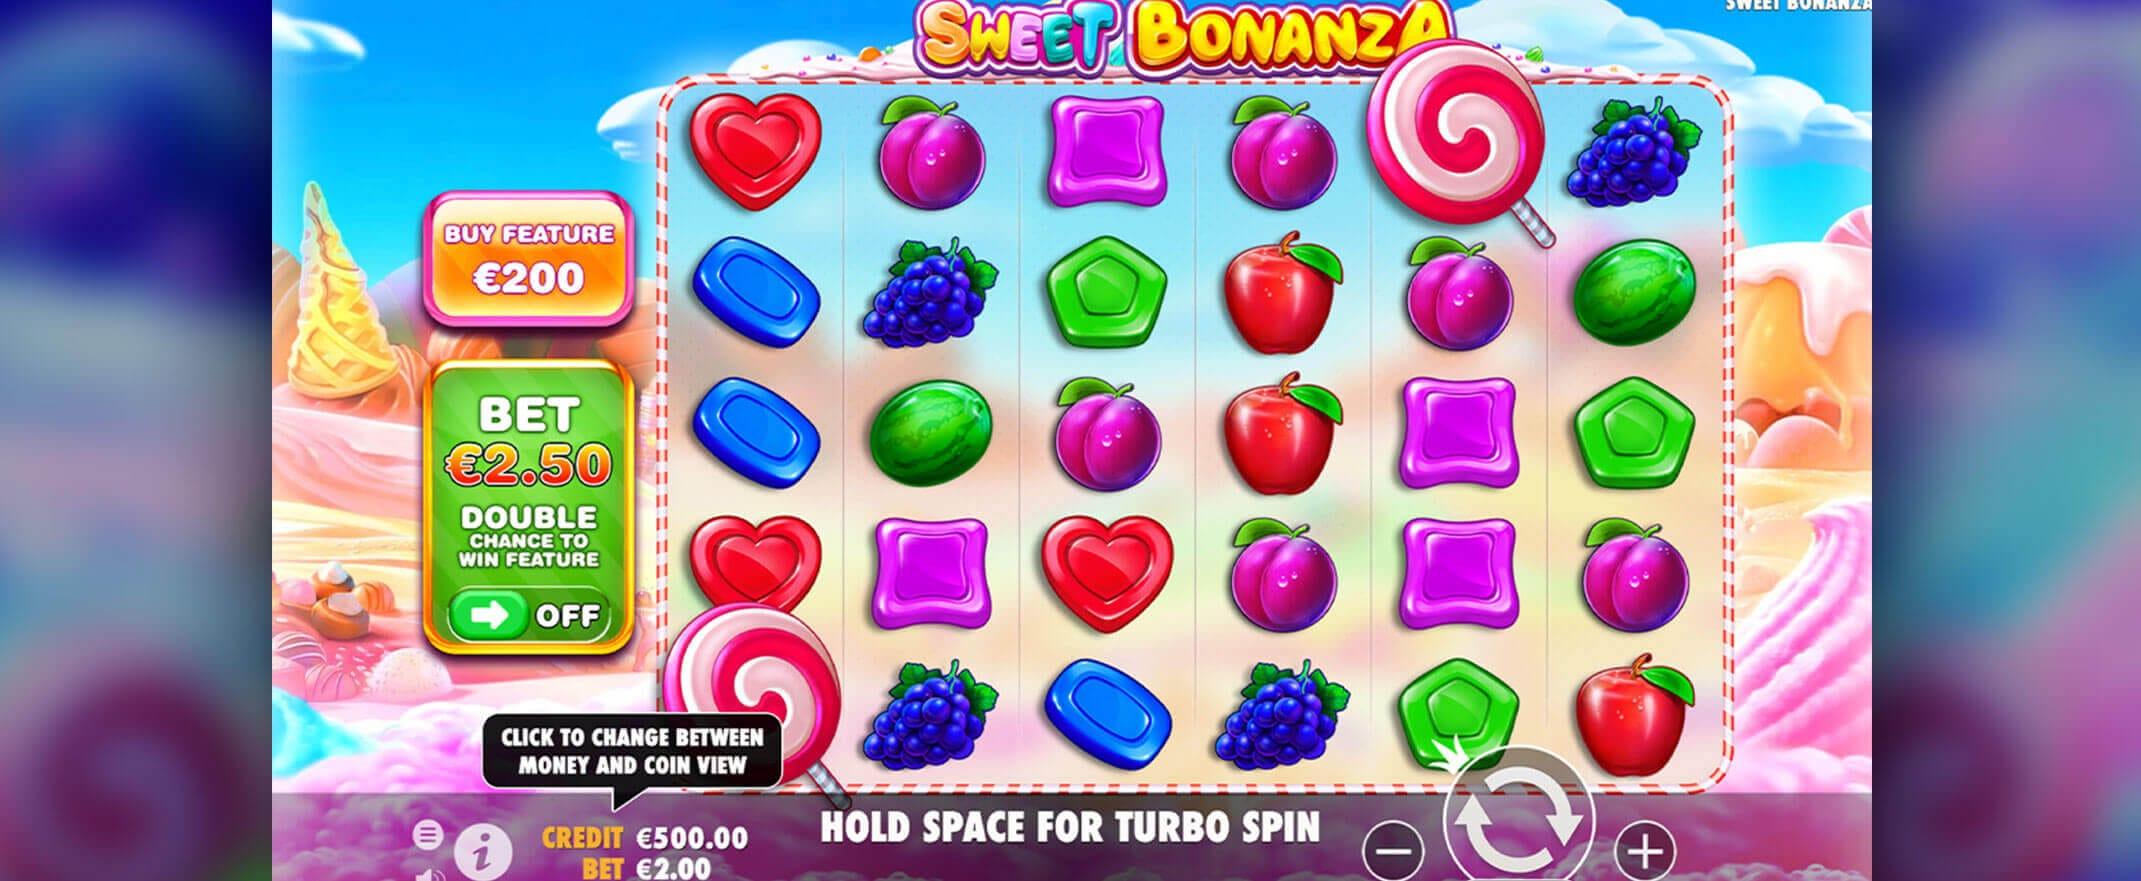 Sweet Bonanza Slot Gameplay